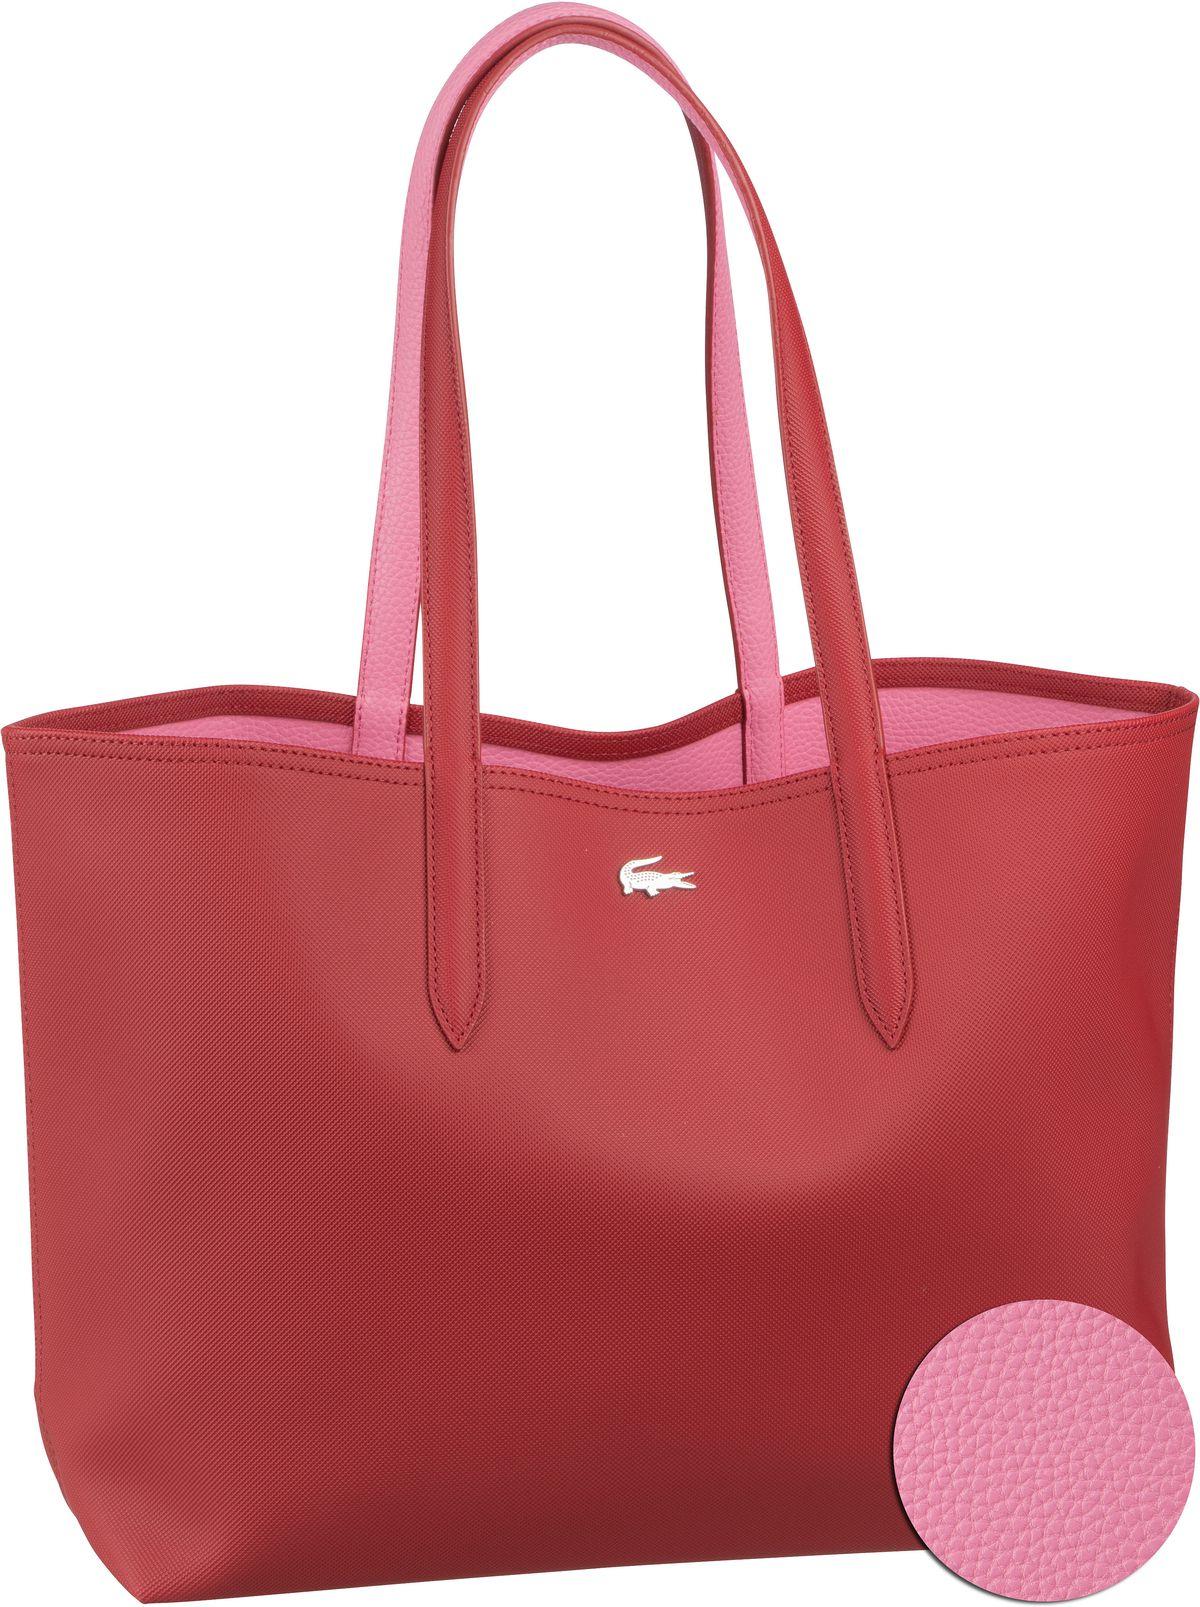 Shopper Anna Shopping Bag 2142 Alizarin Red/Château Rose (innen: Rosa)